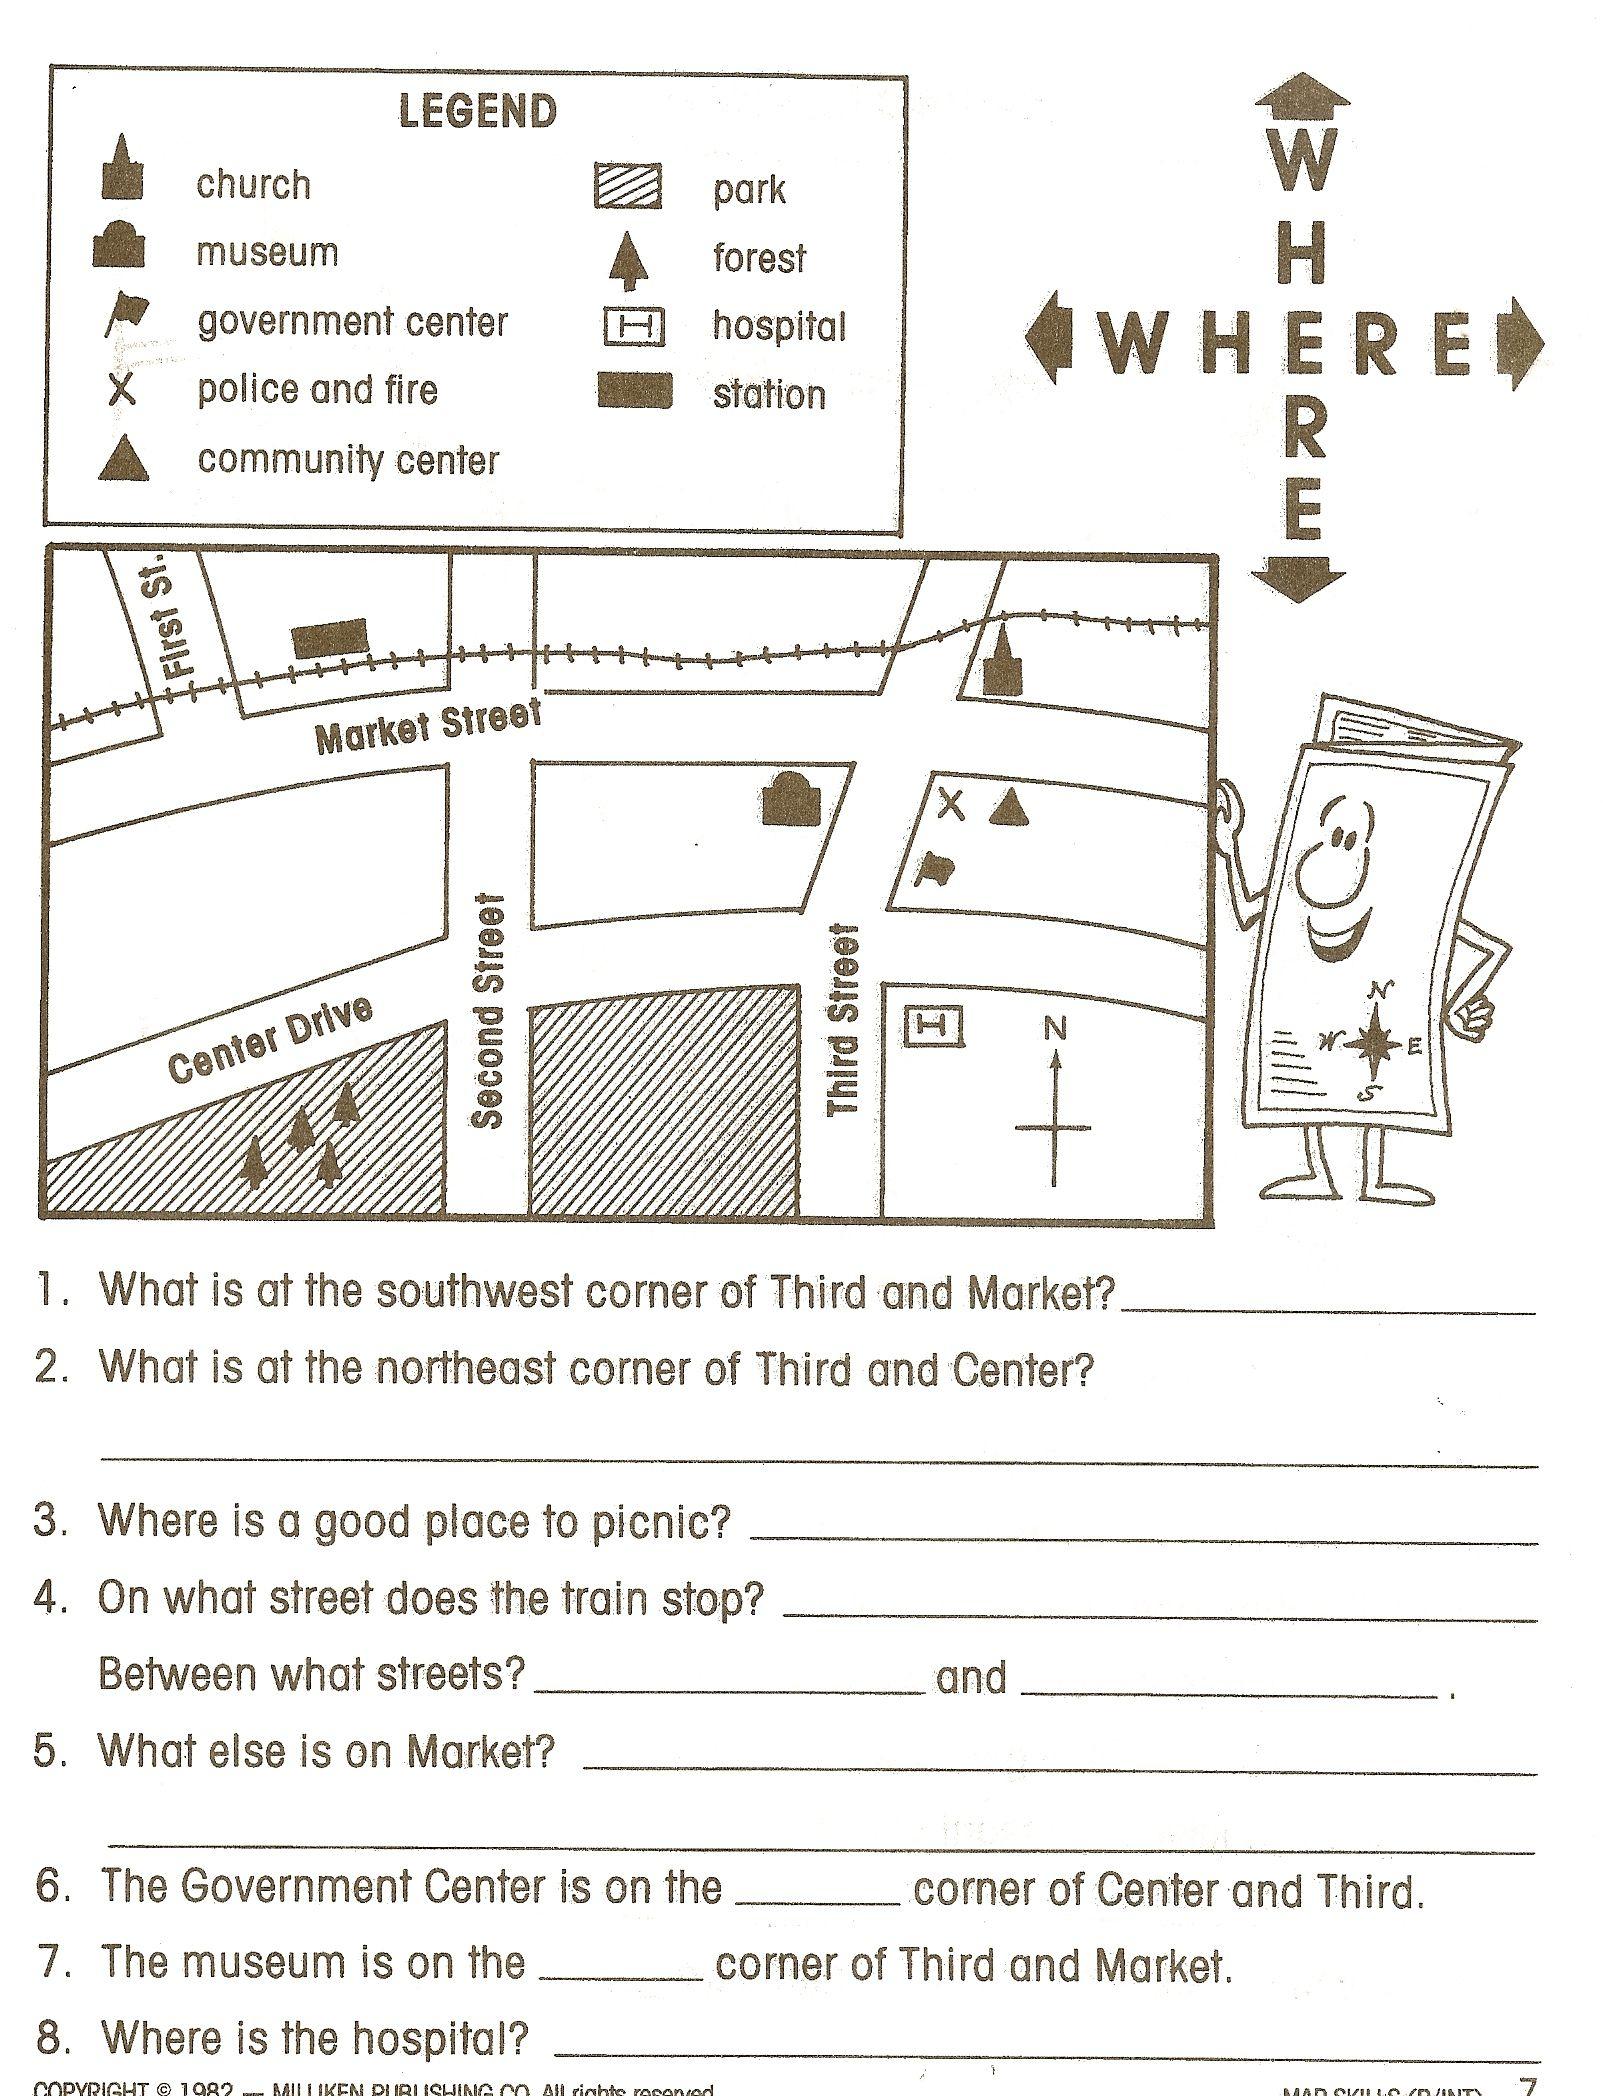 Social Studies Worksheets - Google Search | Social Studies - Free Printable Worksheets For 2Nd Grade Social Studies